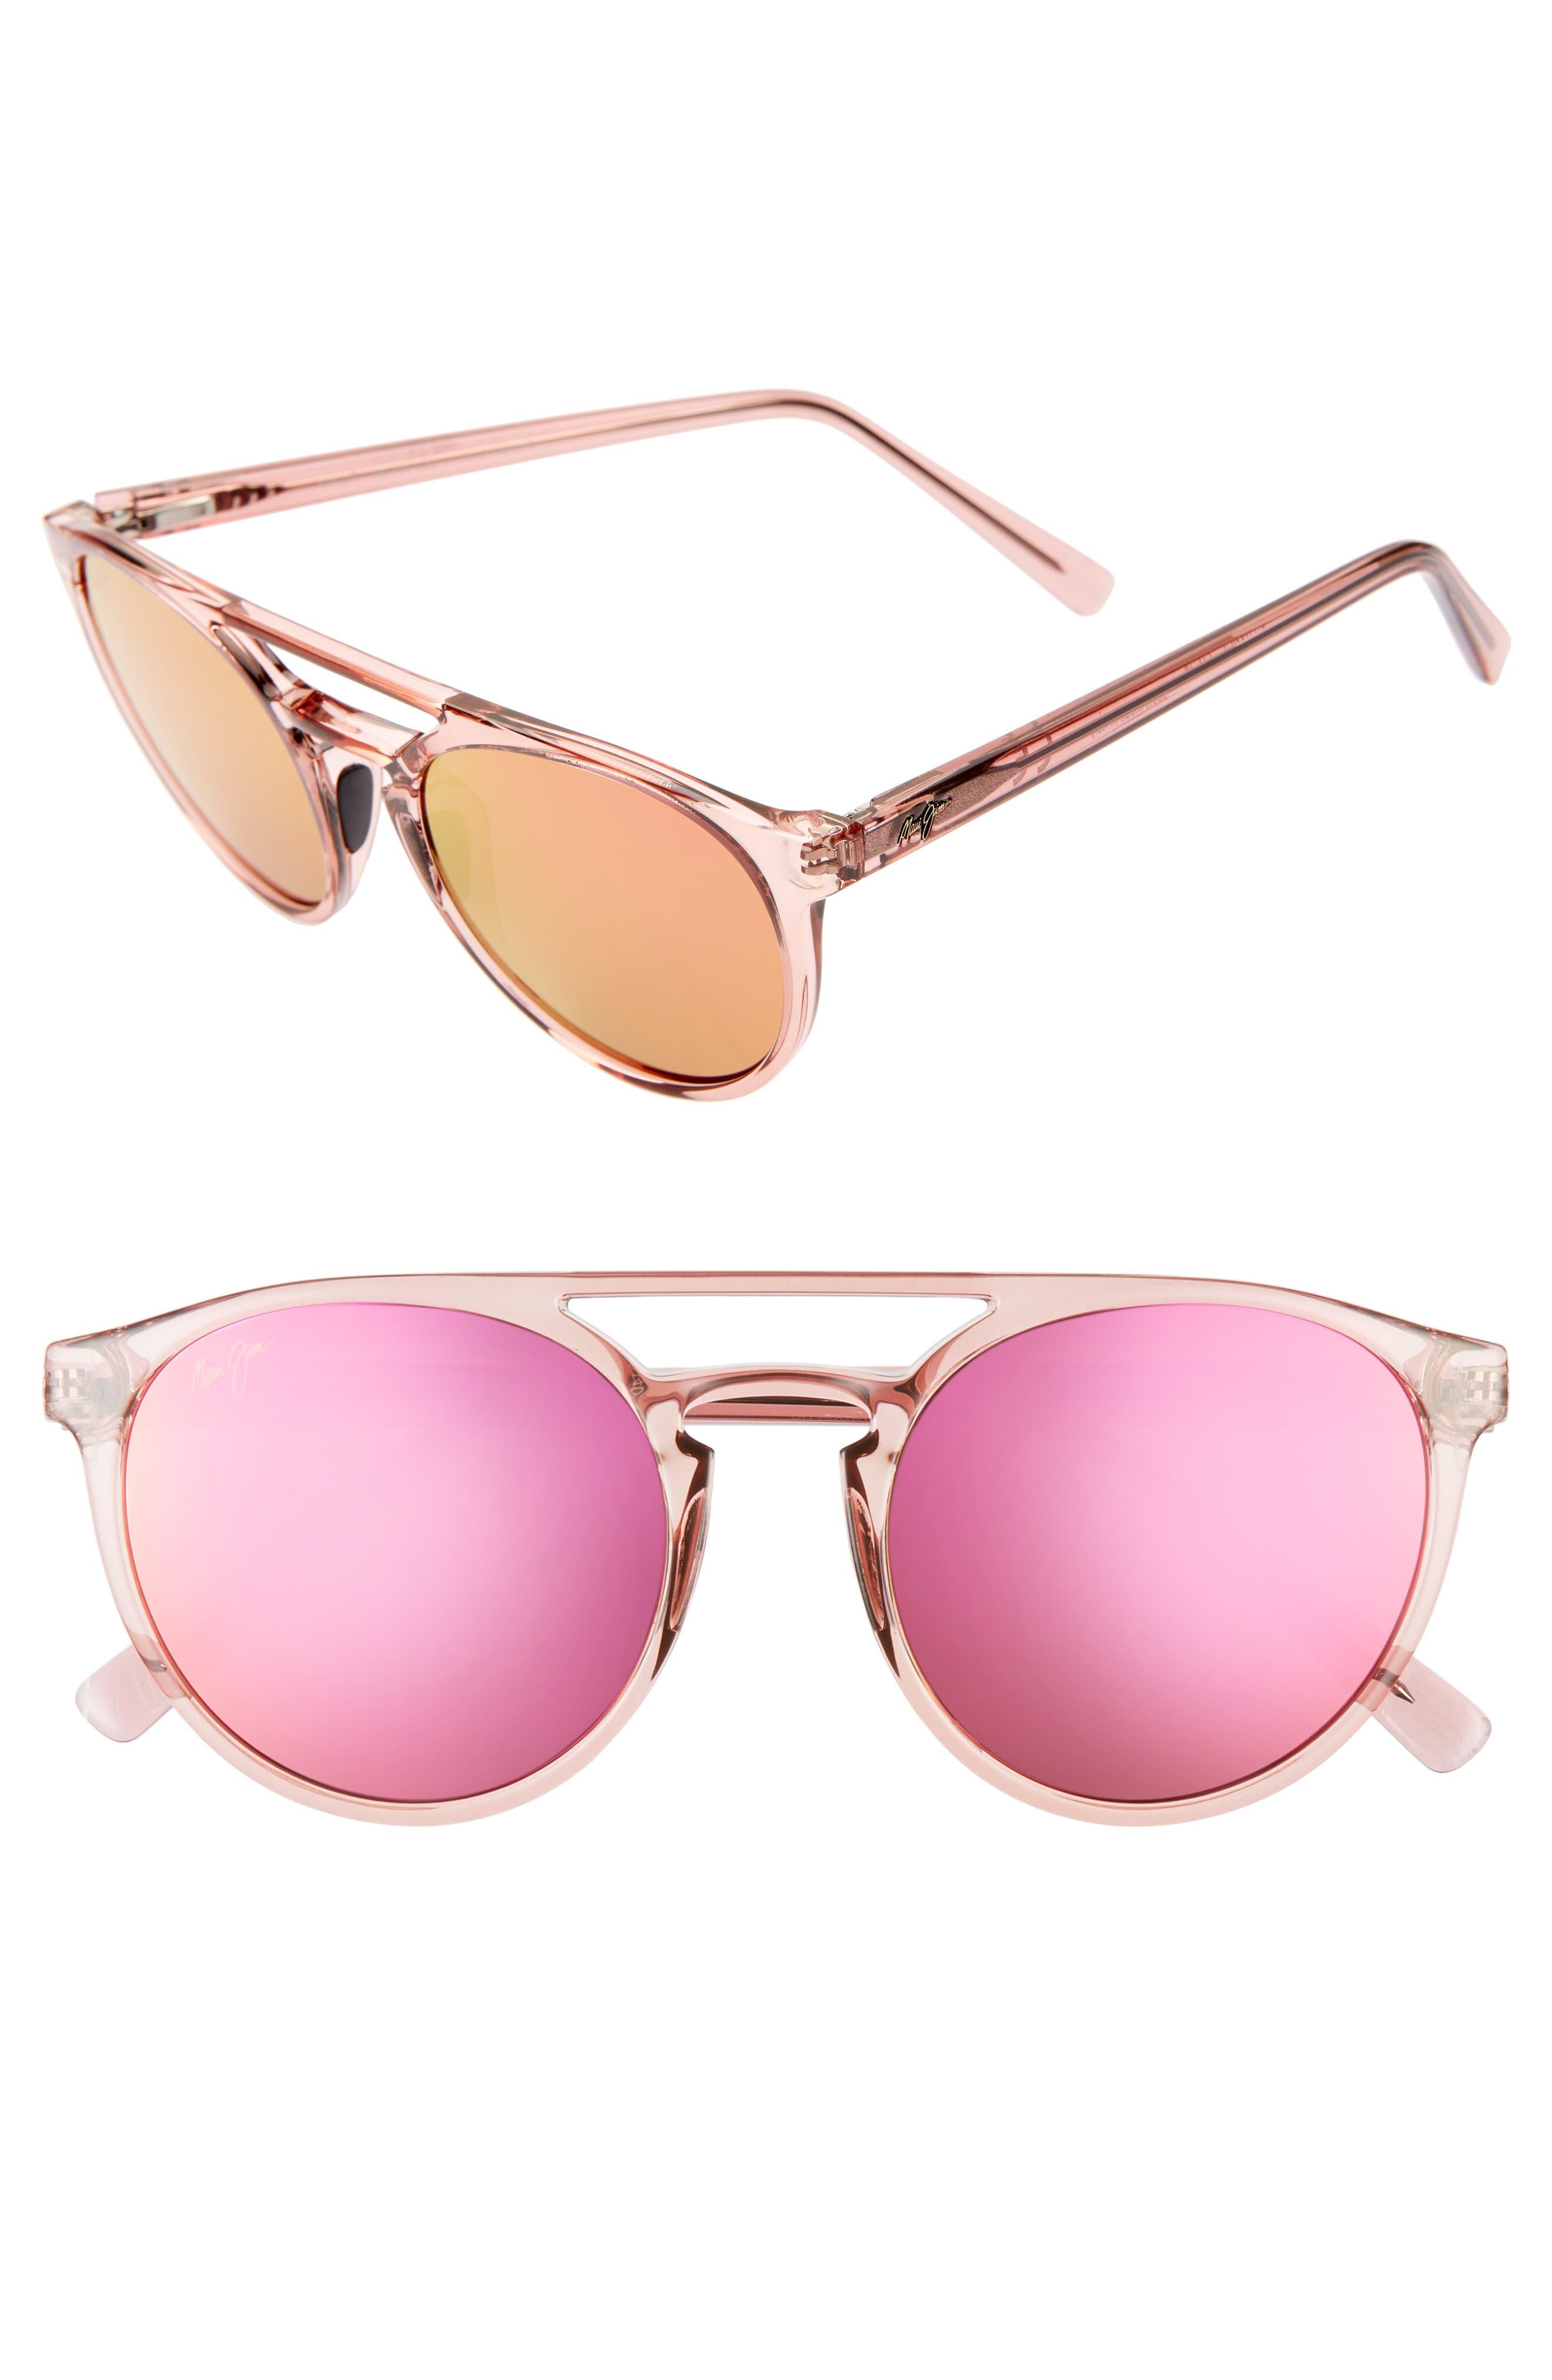 Maui Jim Ah Dang! 52Mm Polarizedplus2 Flat Top Sunglasses - Transparent Pink/ Maui Sunrise